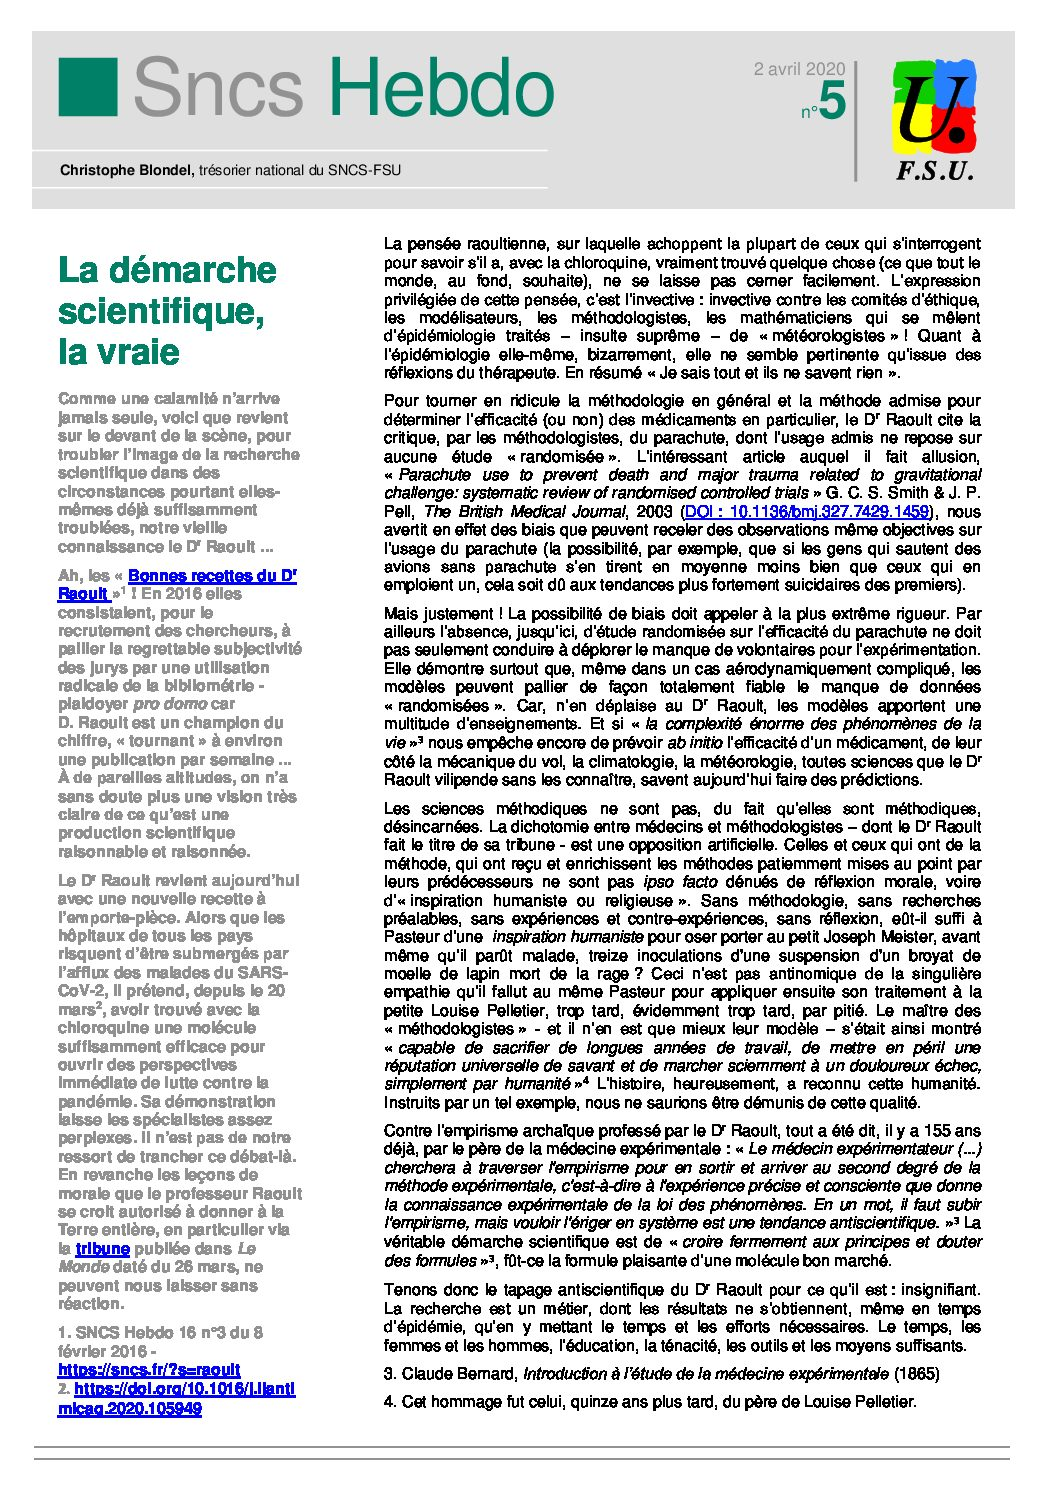 SNCSHEBDO20N°5-1-pdf.jpg